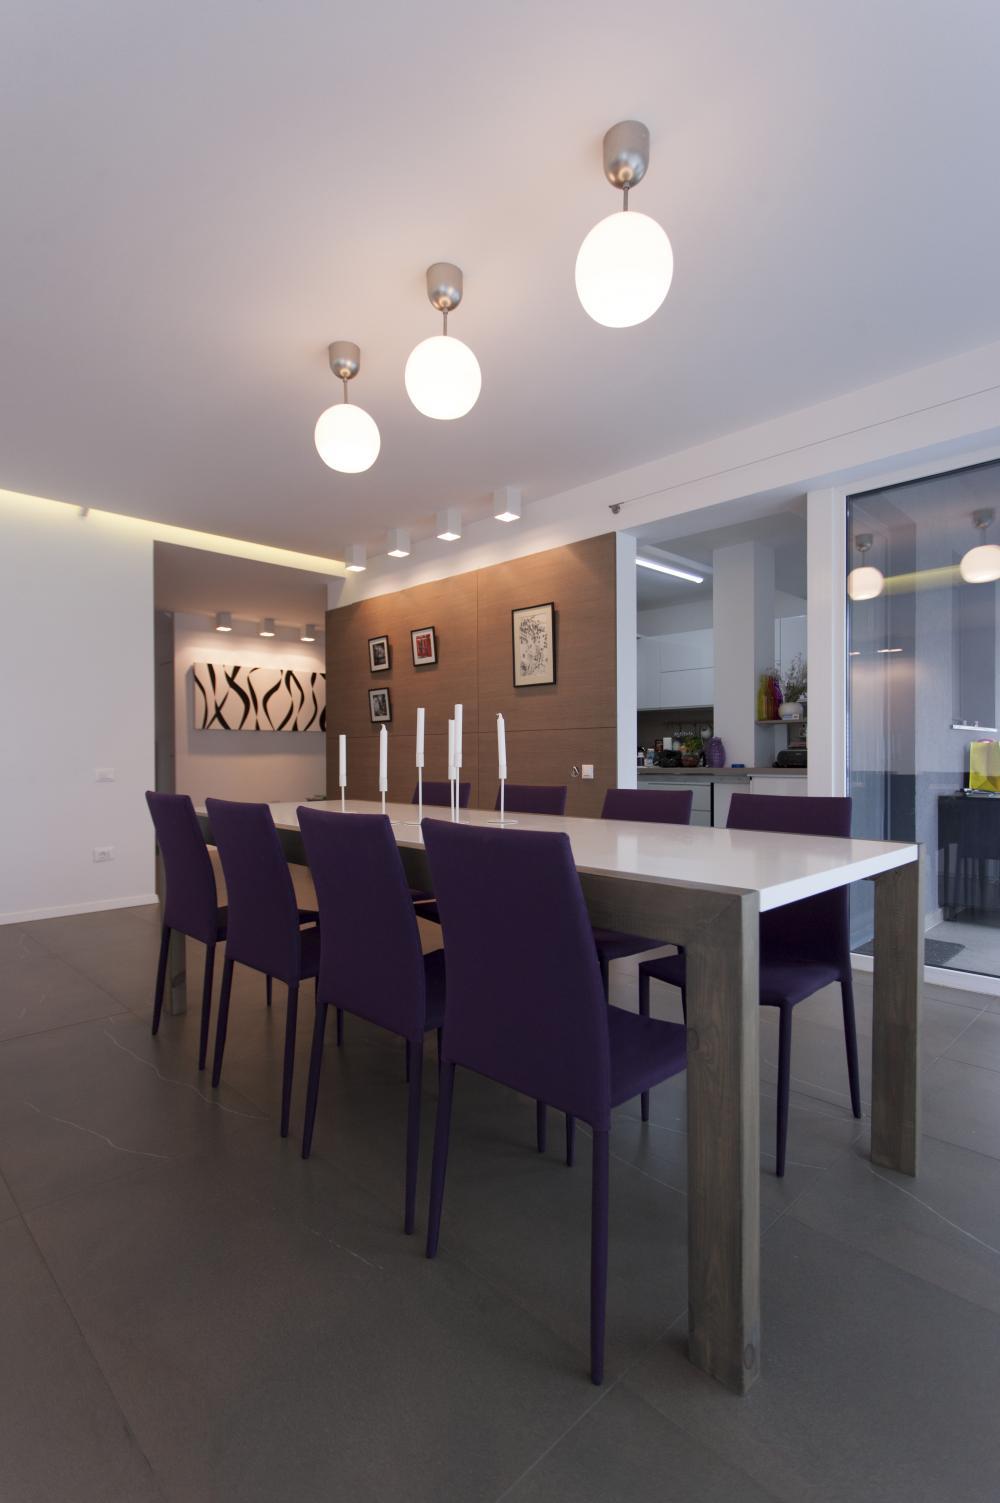 https://nbc-arhitect.ro/wp-content/uploads/2020/11/NBC-Arhitect-_-interior-design-_-Magenta-House-_-Romania_6.jpg